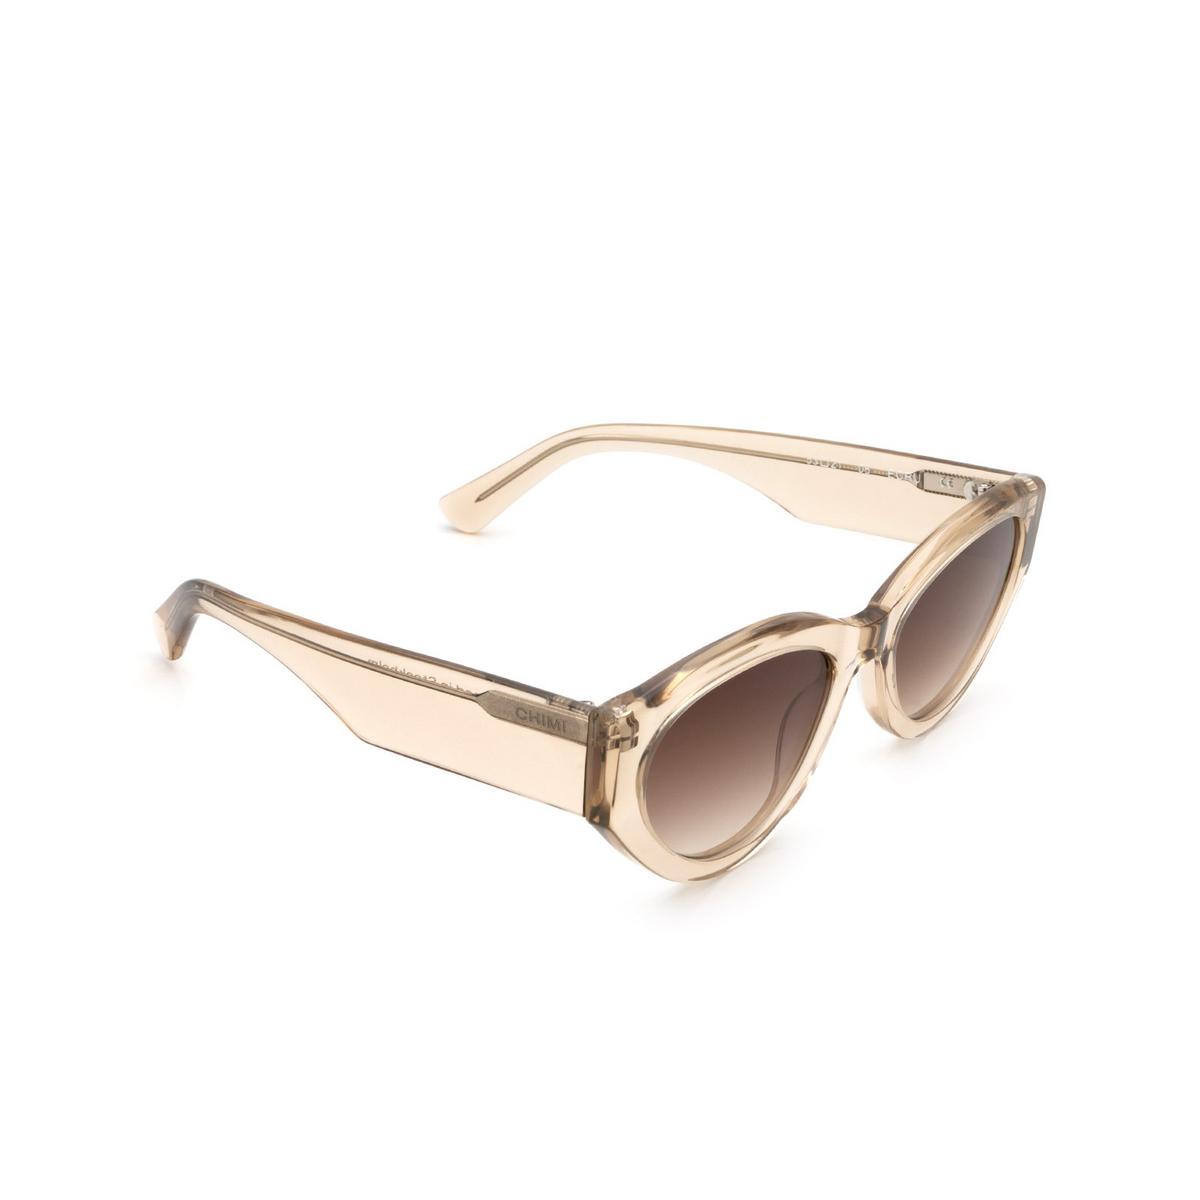 Chimi® Cat-eye Sunglasses: 06 color Ecru - three-quarters view.